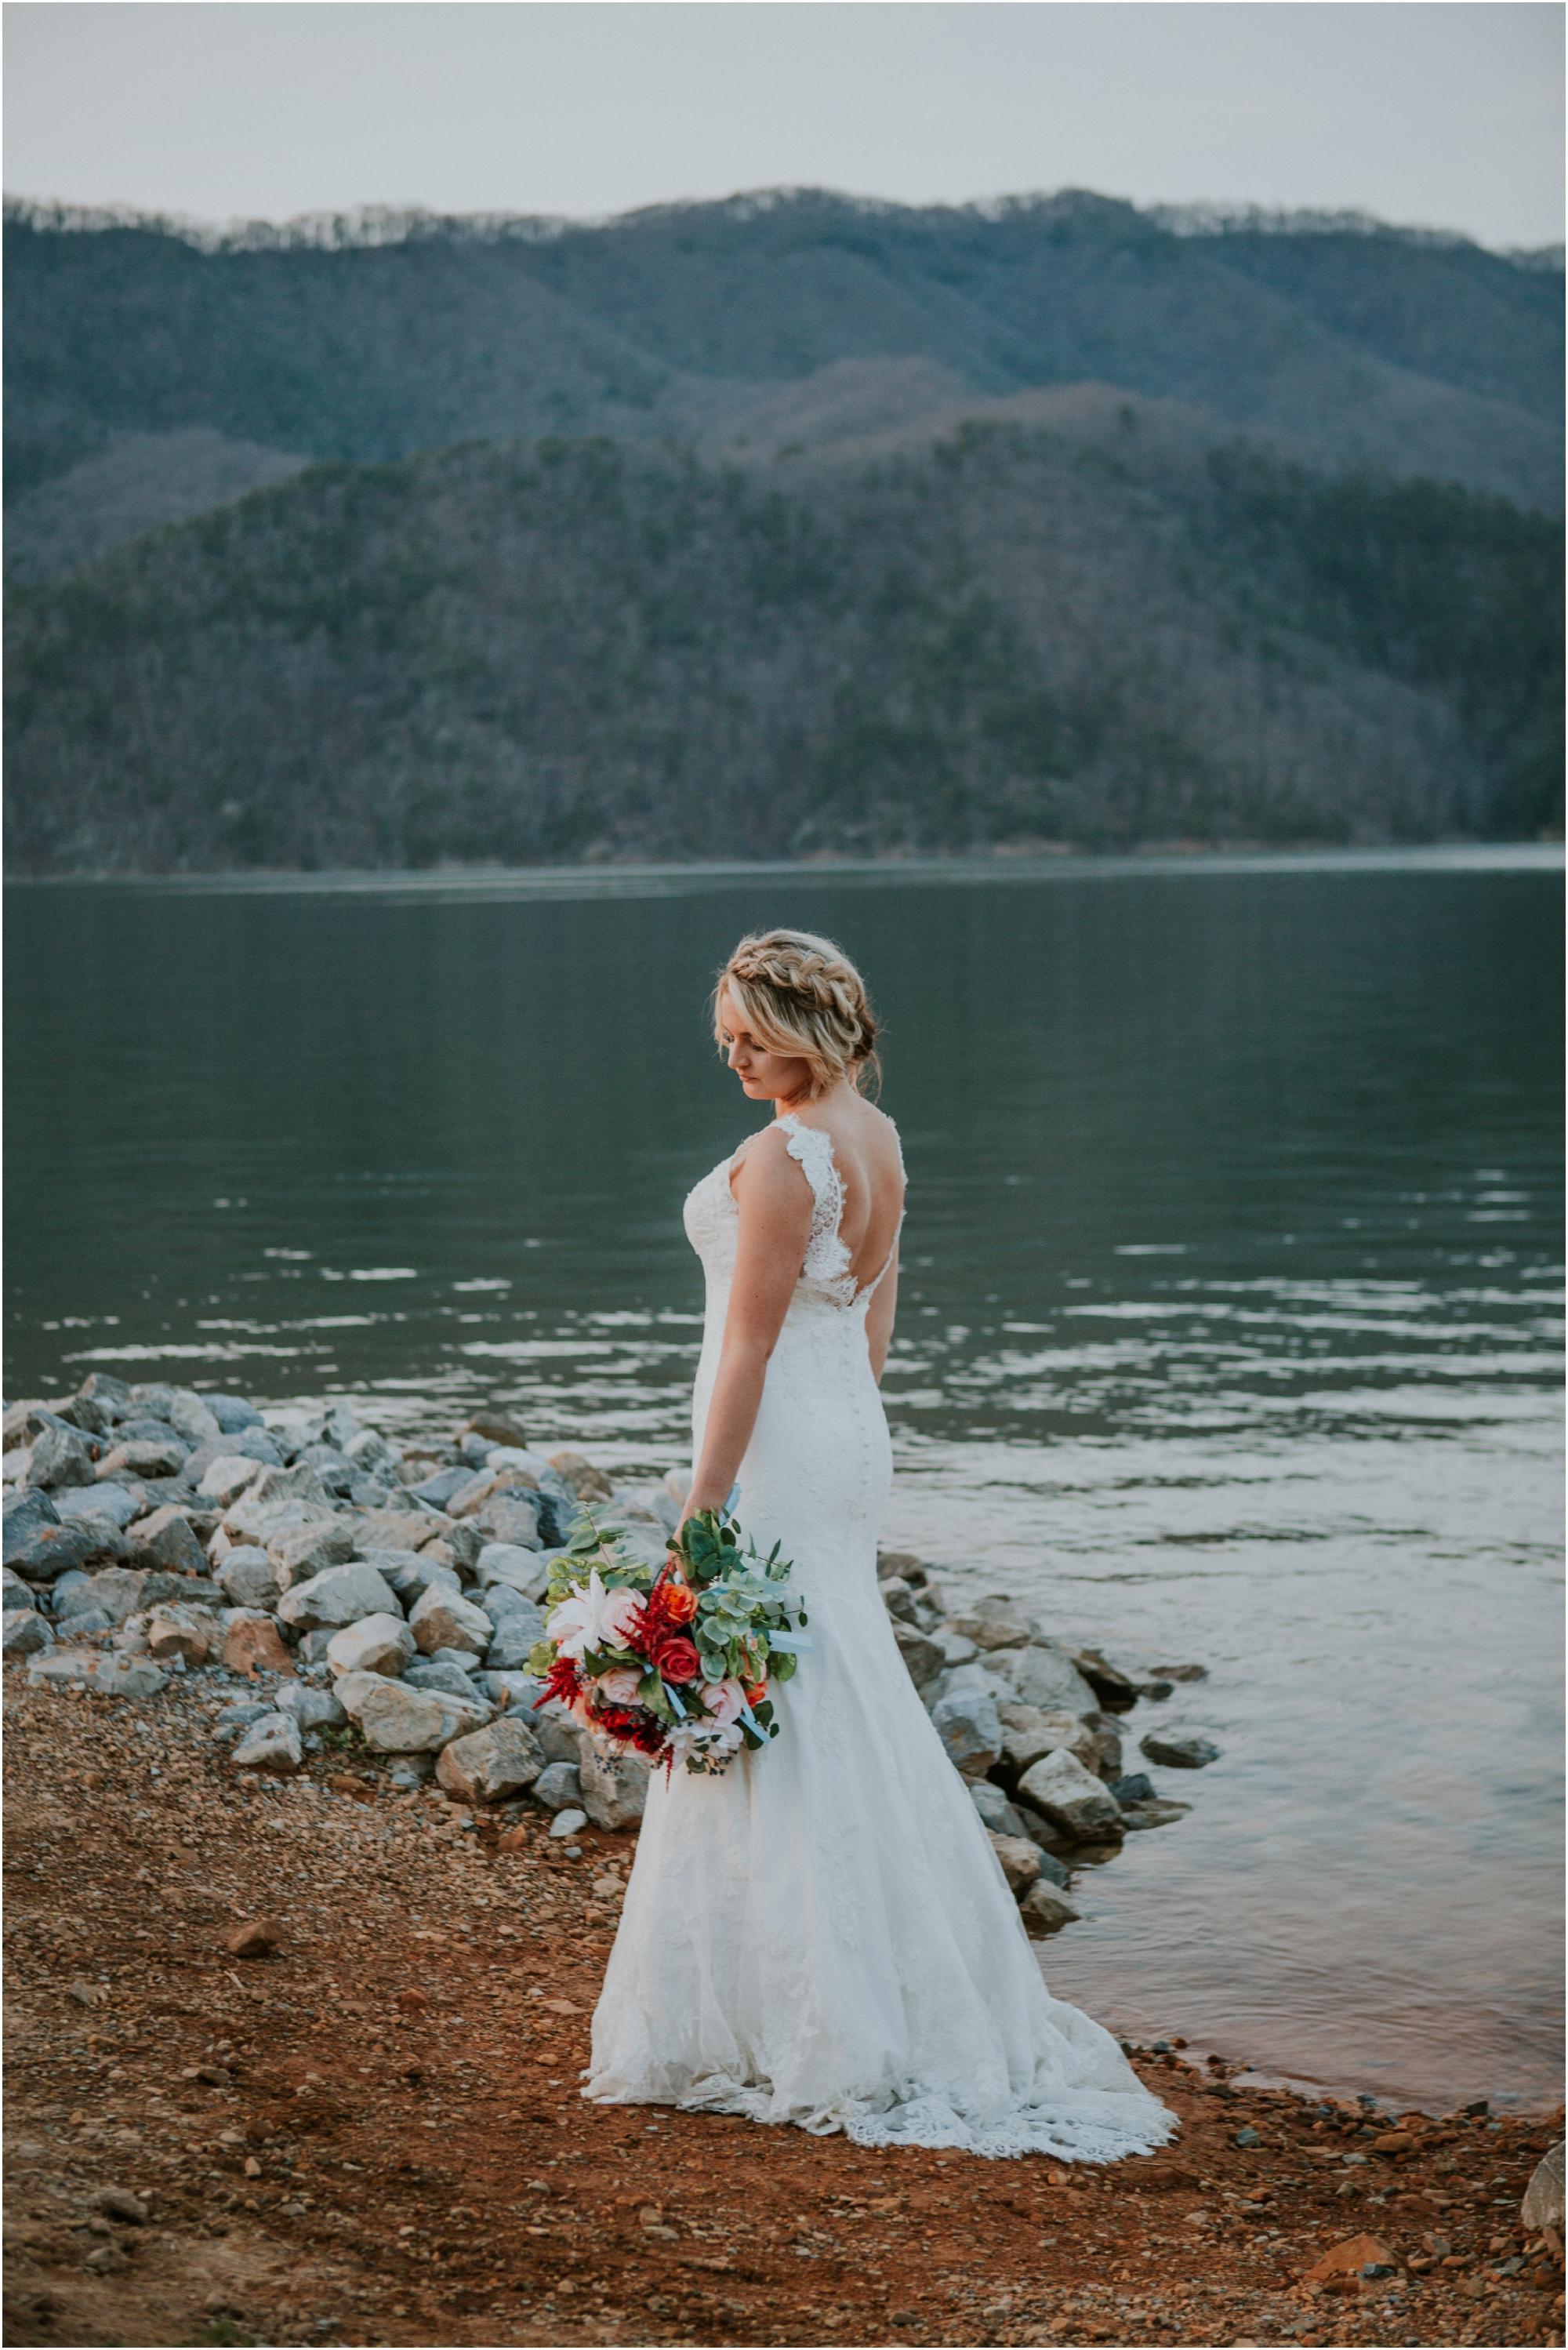 watauga-lake--bohemian-bridal-styled-session-northeast-tennessee-wedding-elopement-photography_0020.jpg